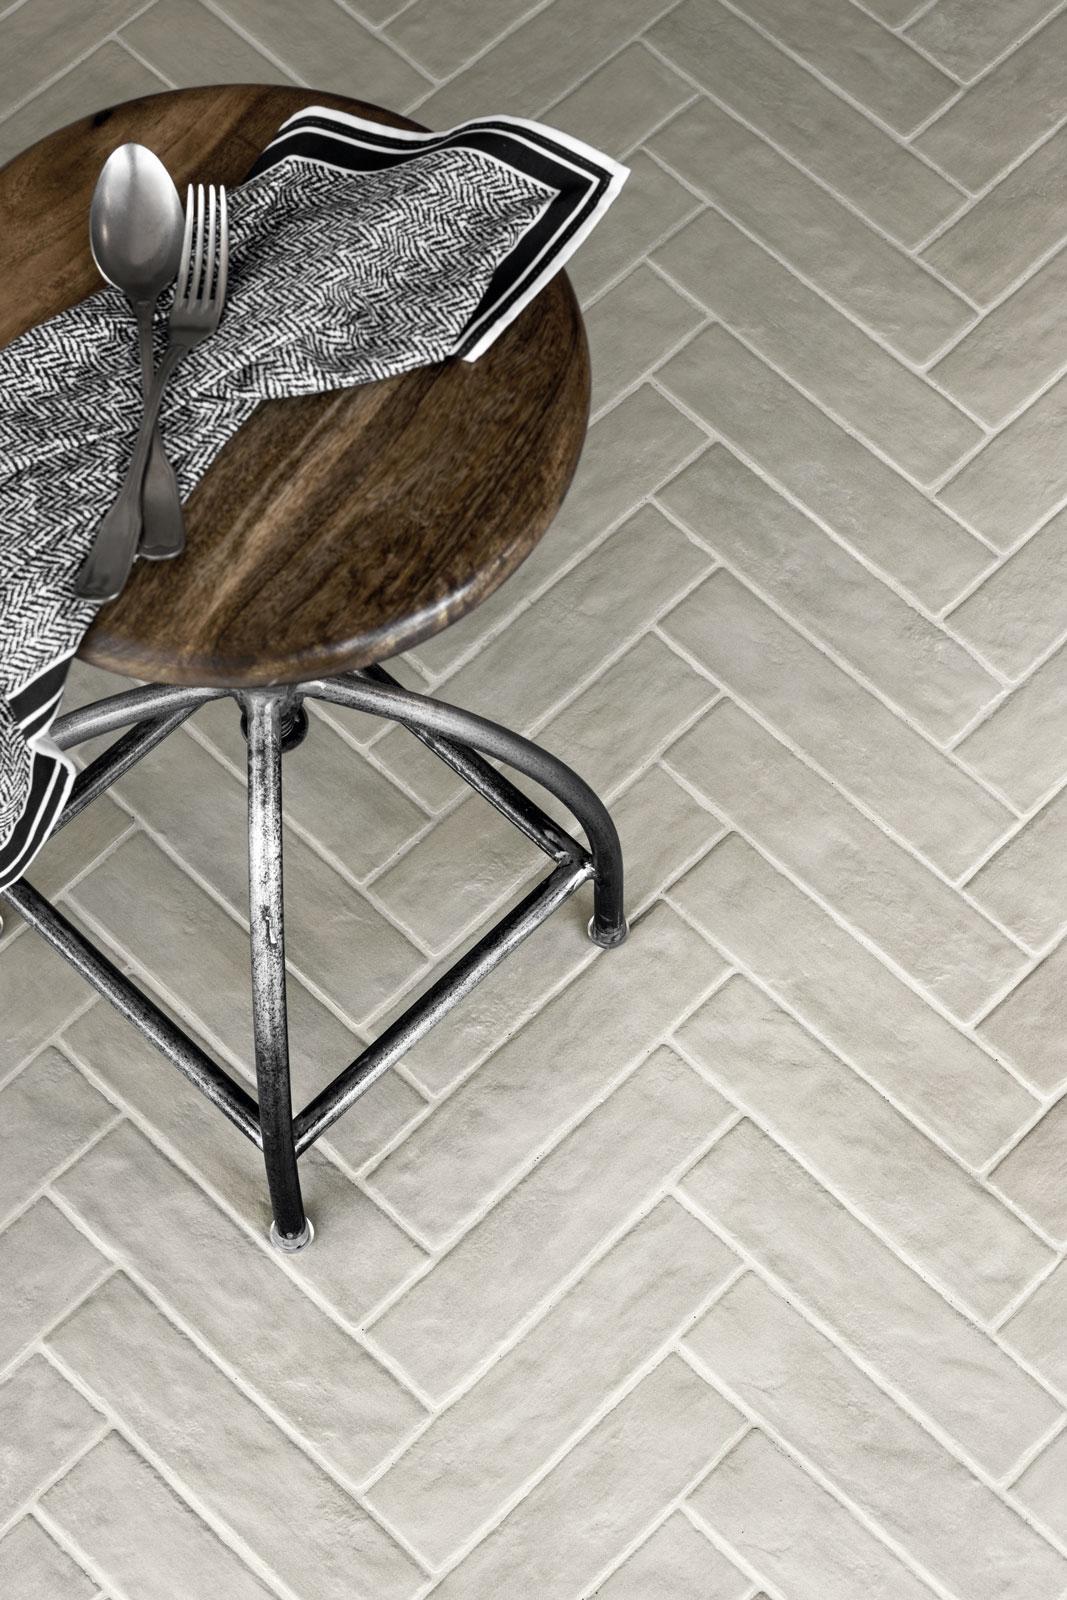 Concrete effect porcelain stoneware marazzi bricco concrete effect kitchen dailygadgetfo Image collections